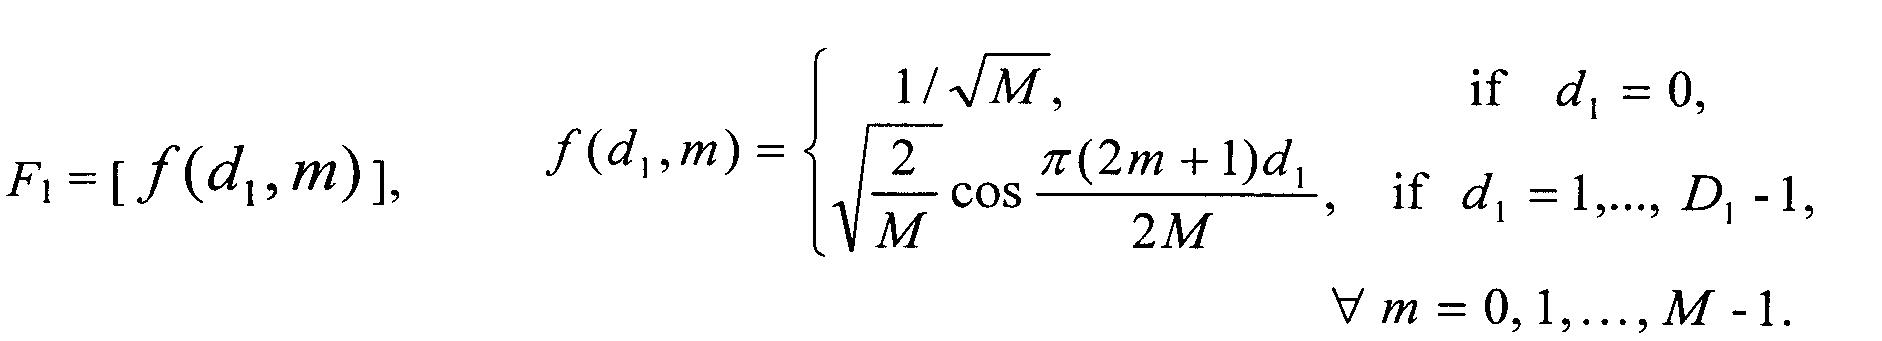 Figure 00000002